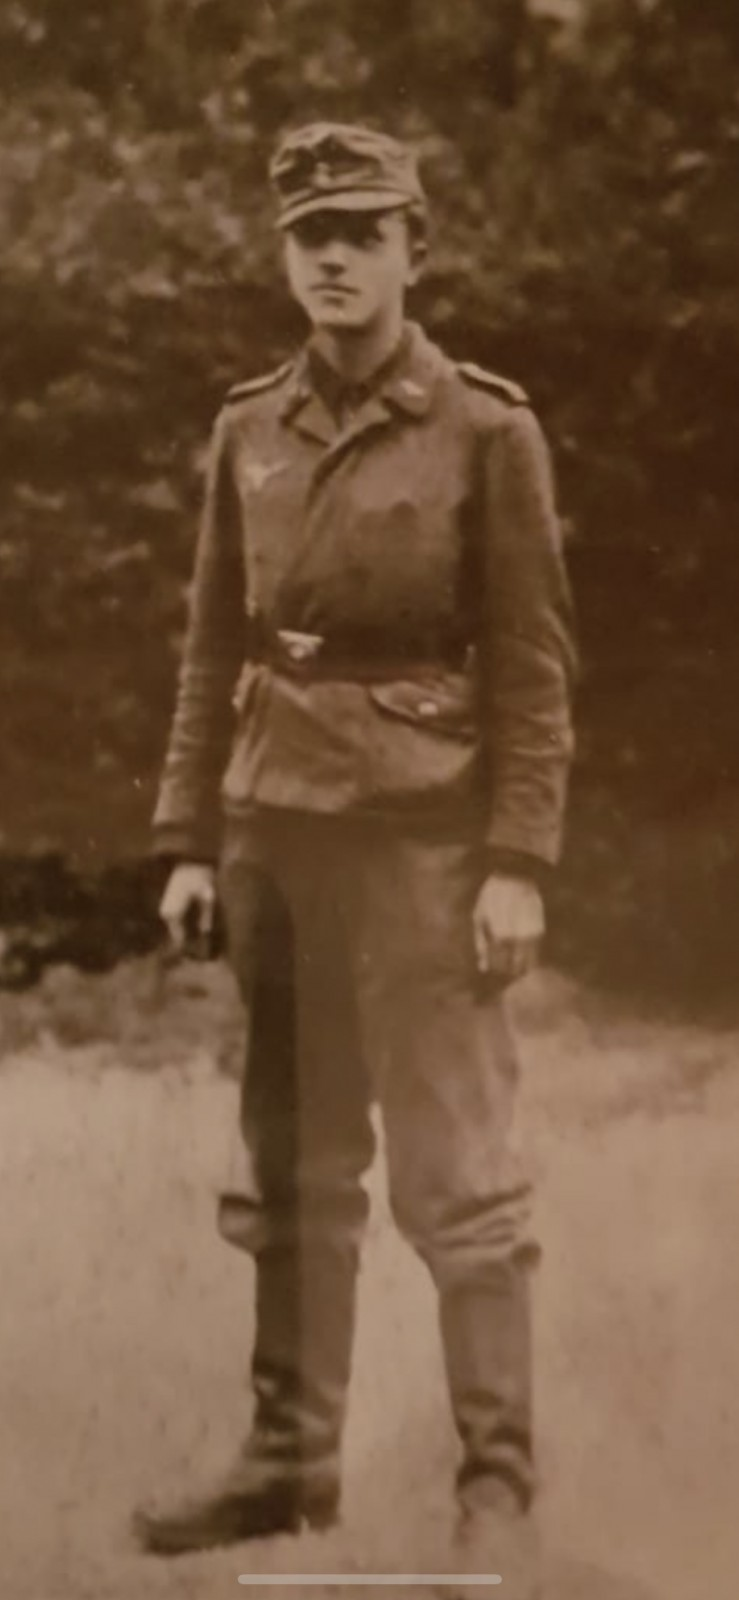 Heinz Emil Fritz Brassinne